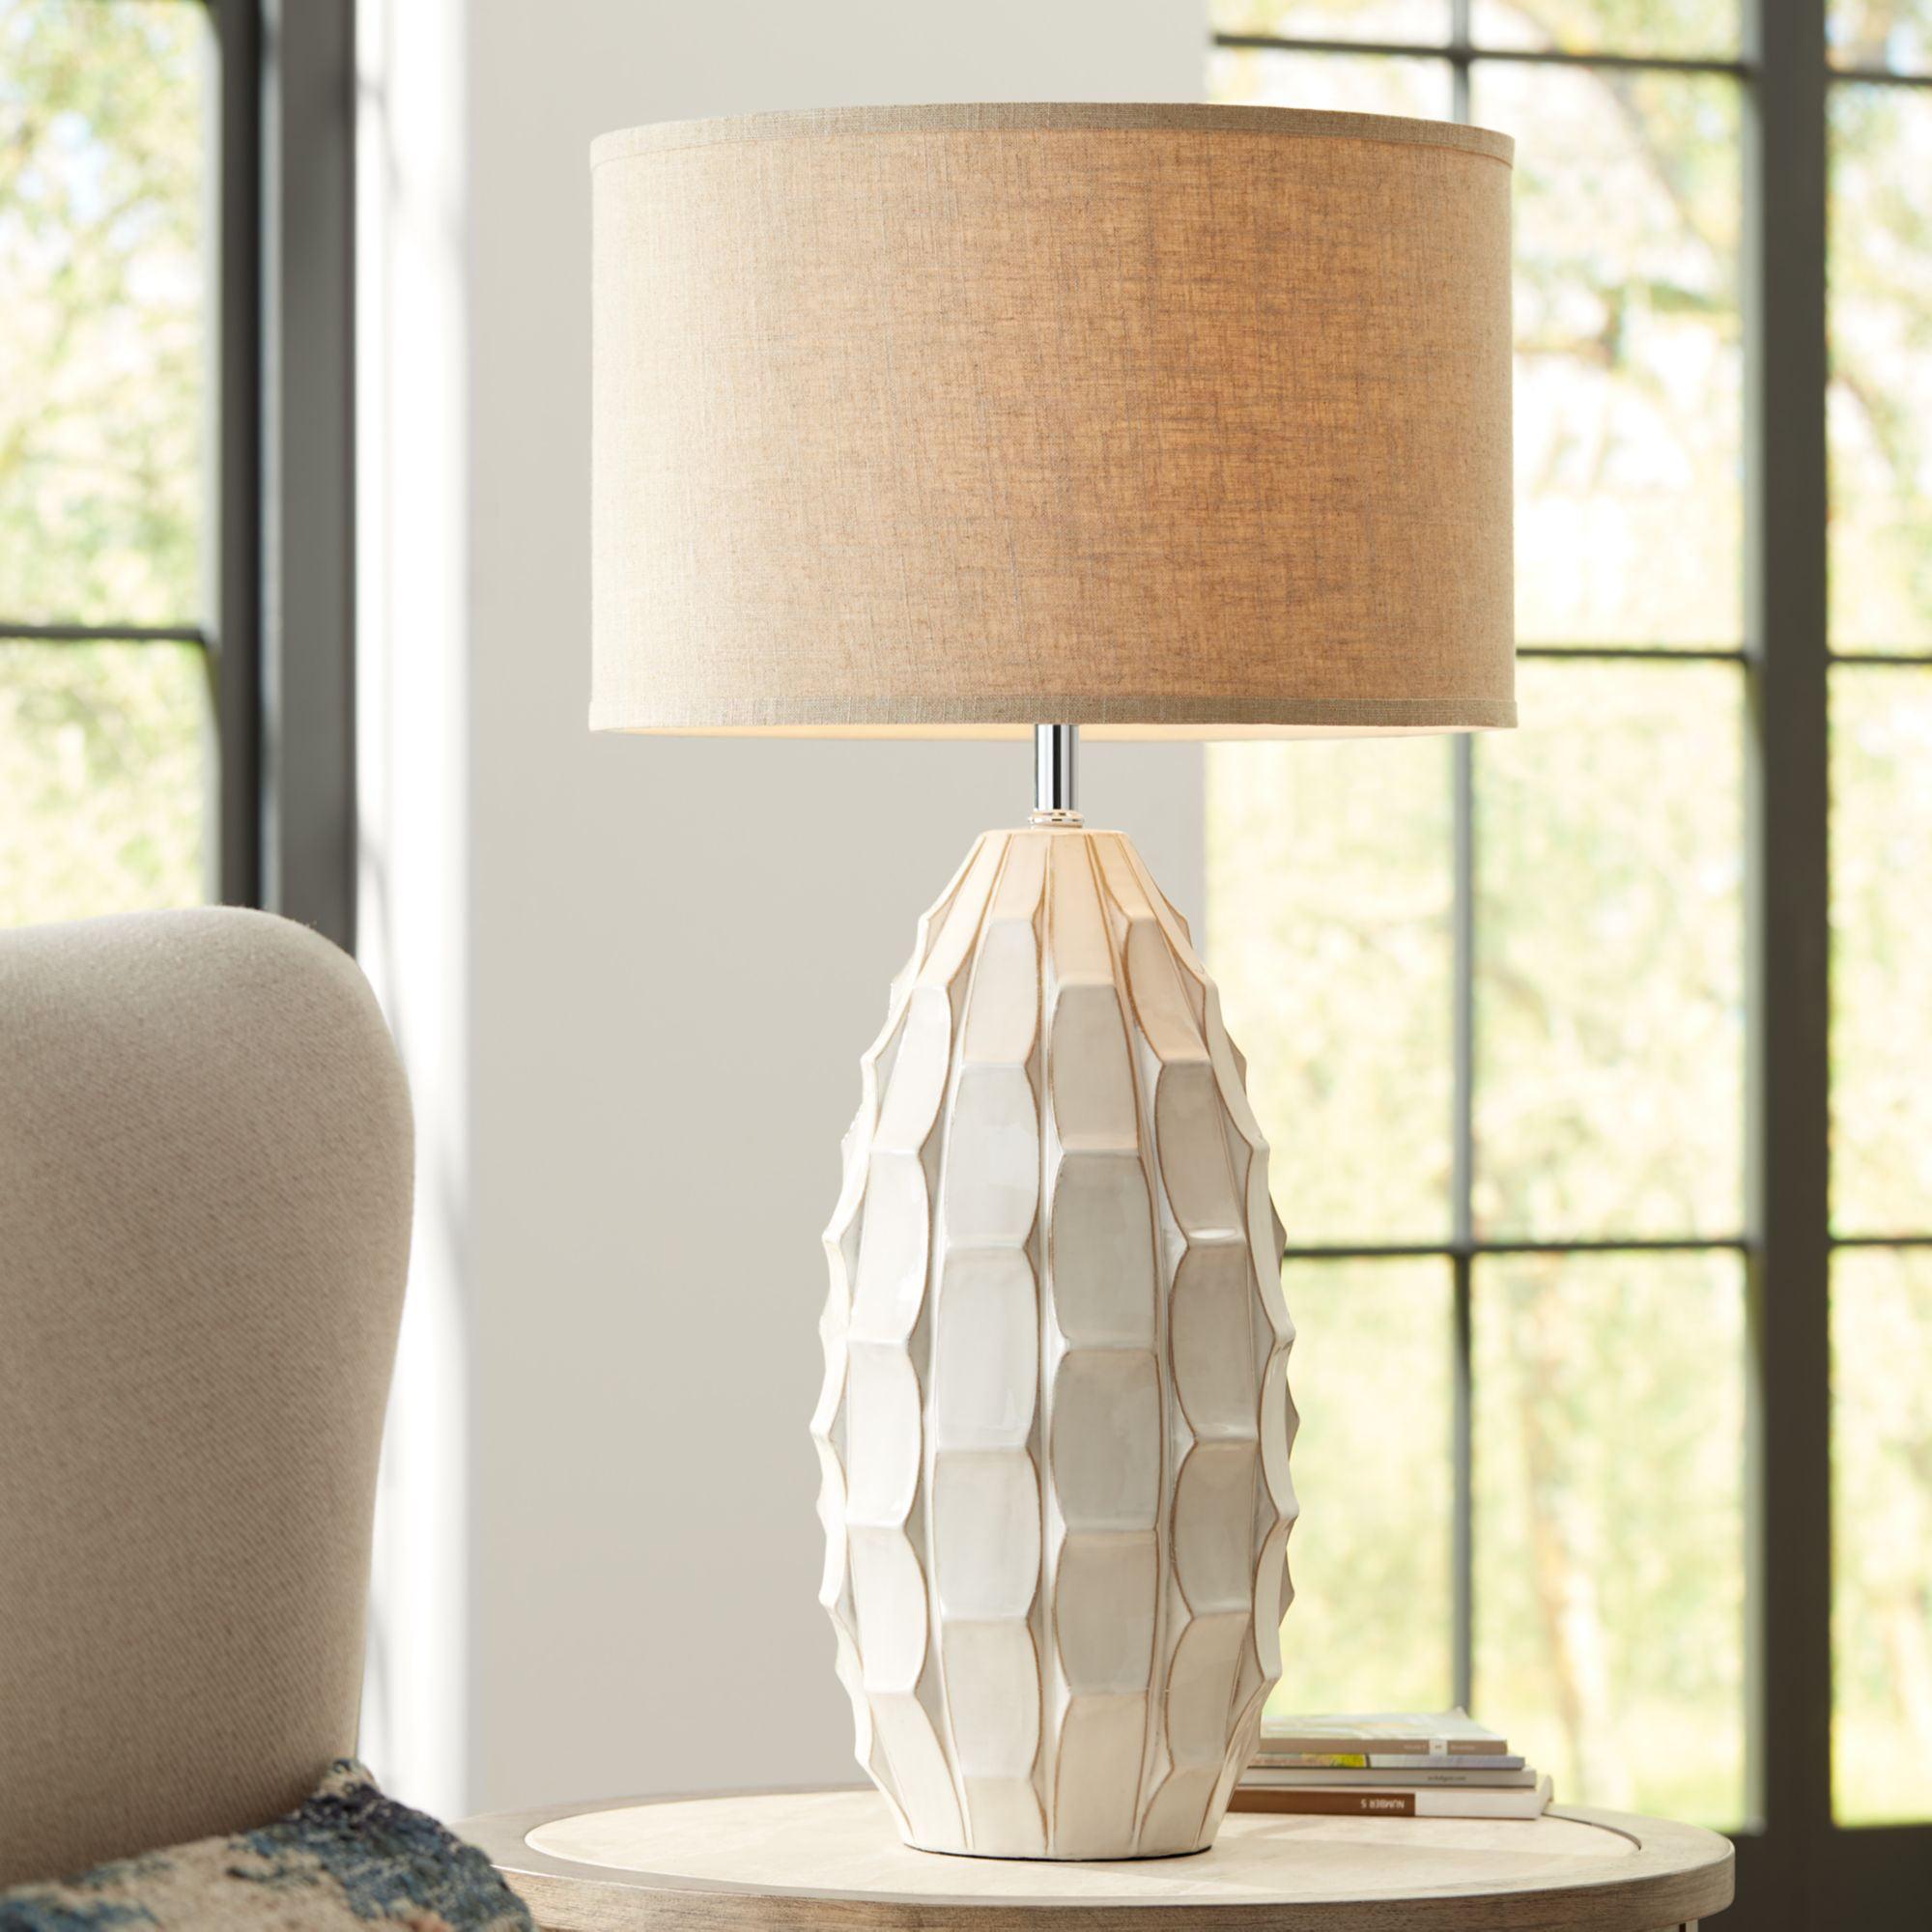 Possini Euro Design Mid Century Modern Table Lamp Ceramic White